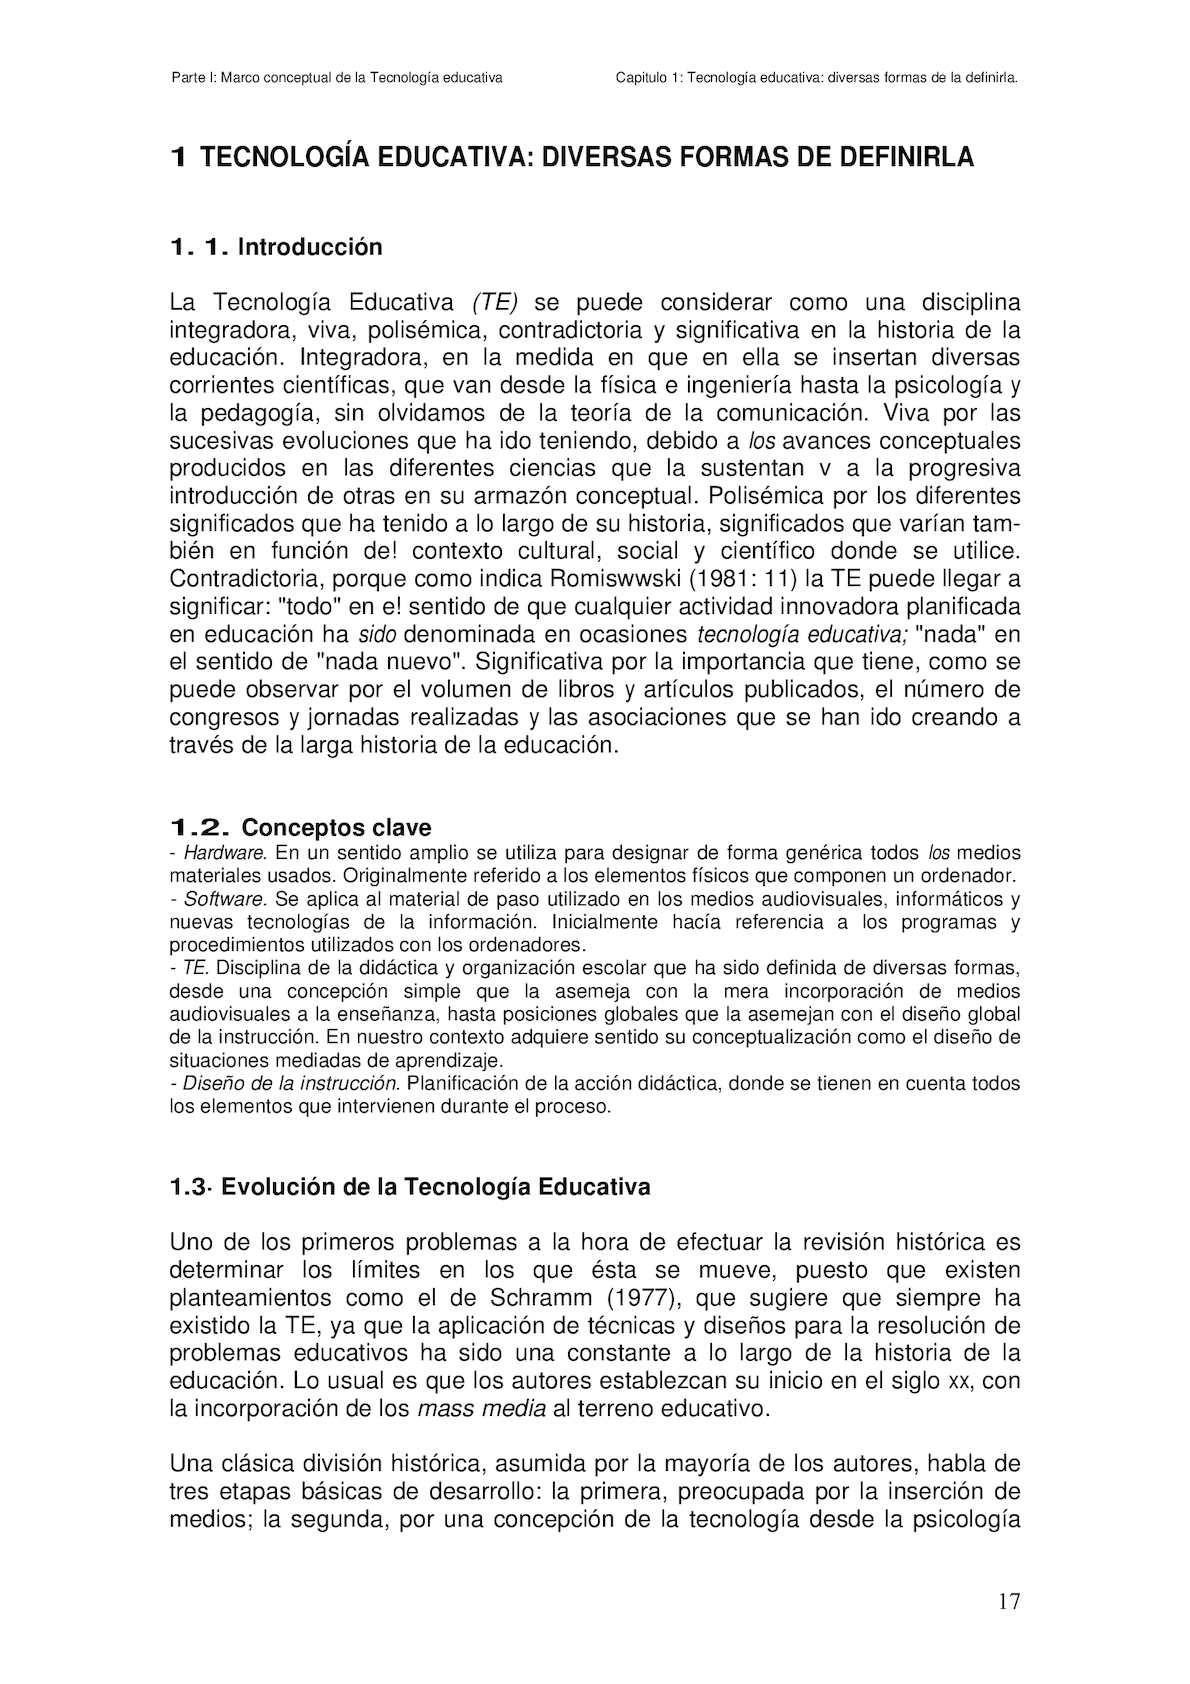 2 Tecnologias Educativa Diversas Formas De Definirla